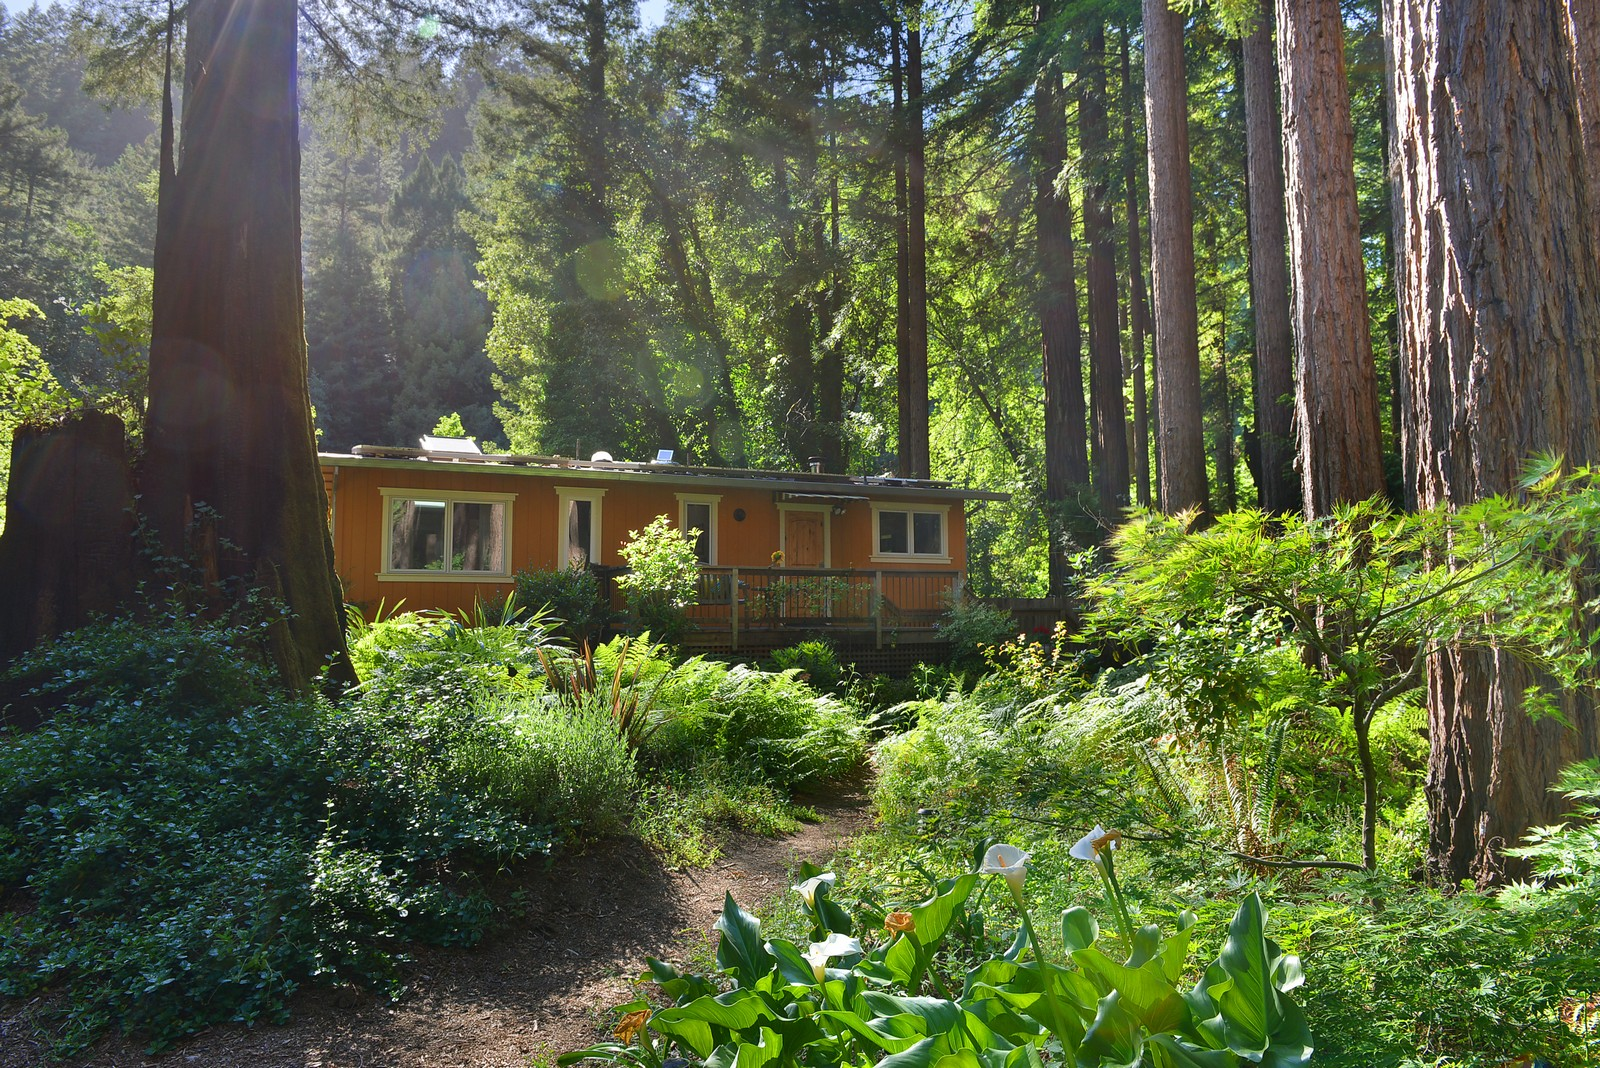 Single Family Home for Sale at Heronwood 1745 Austin Creek Road Cazadero, California, 95421 United States